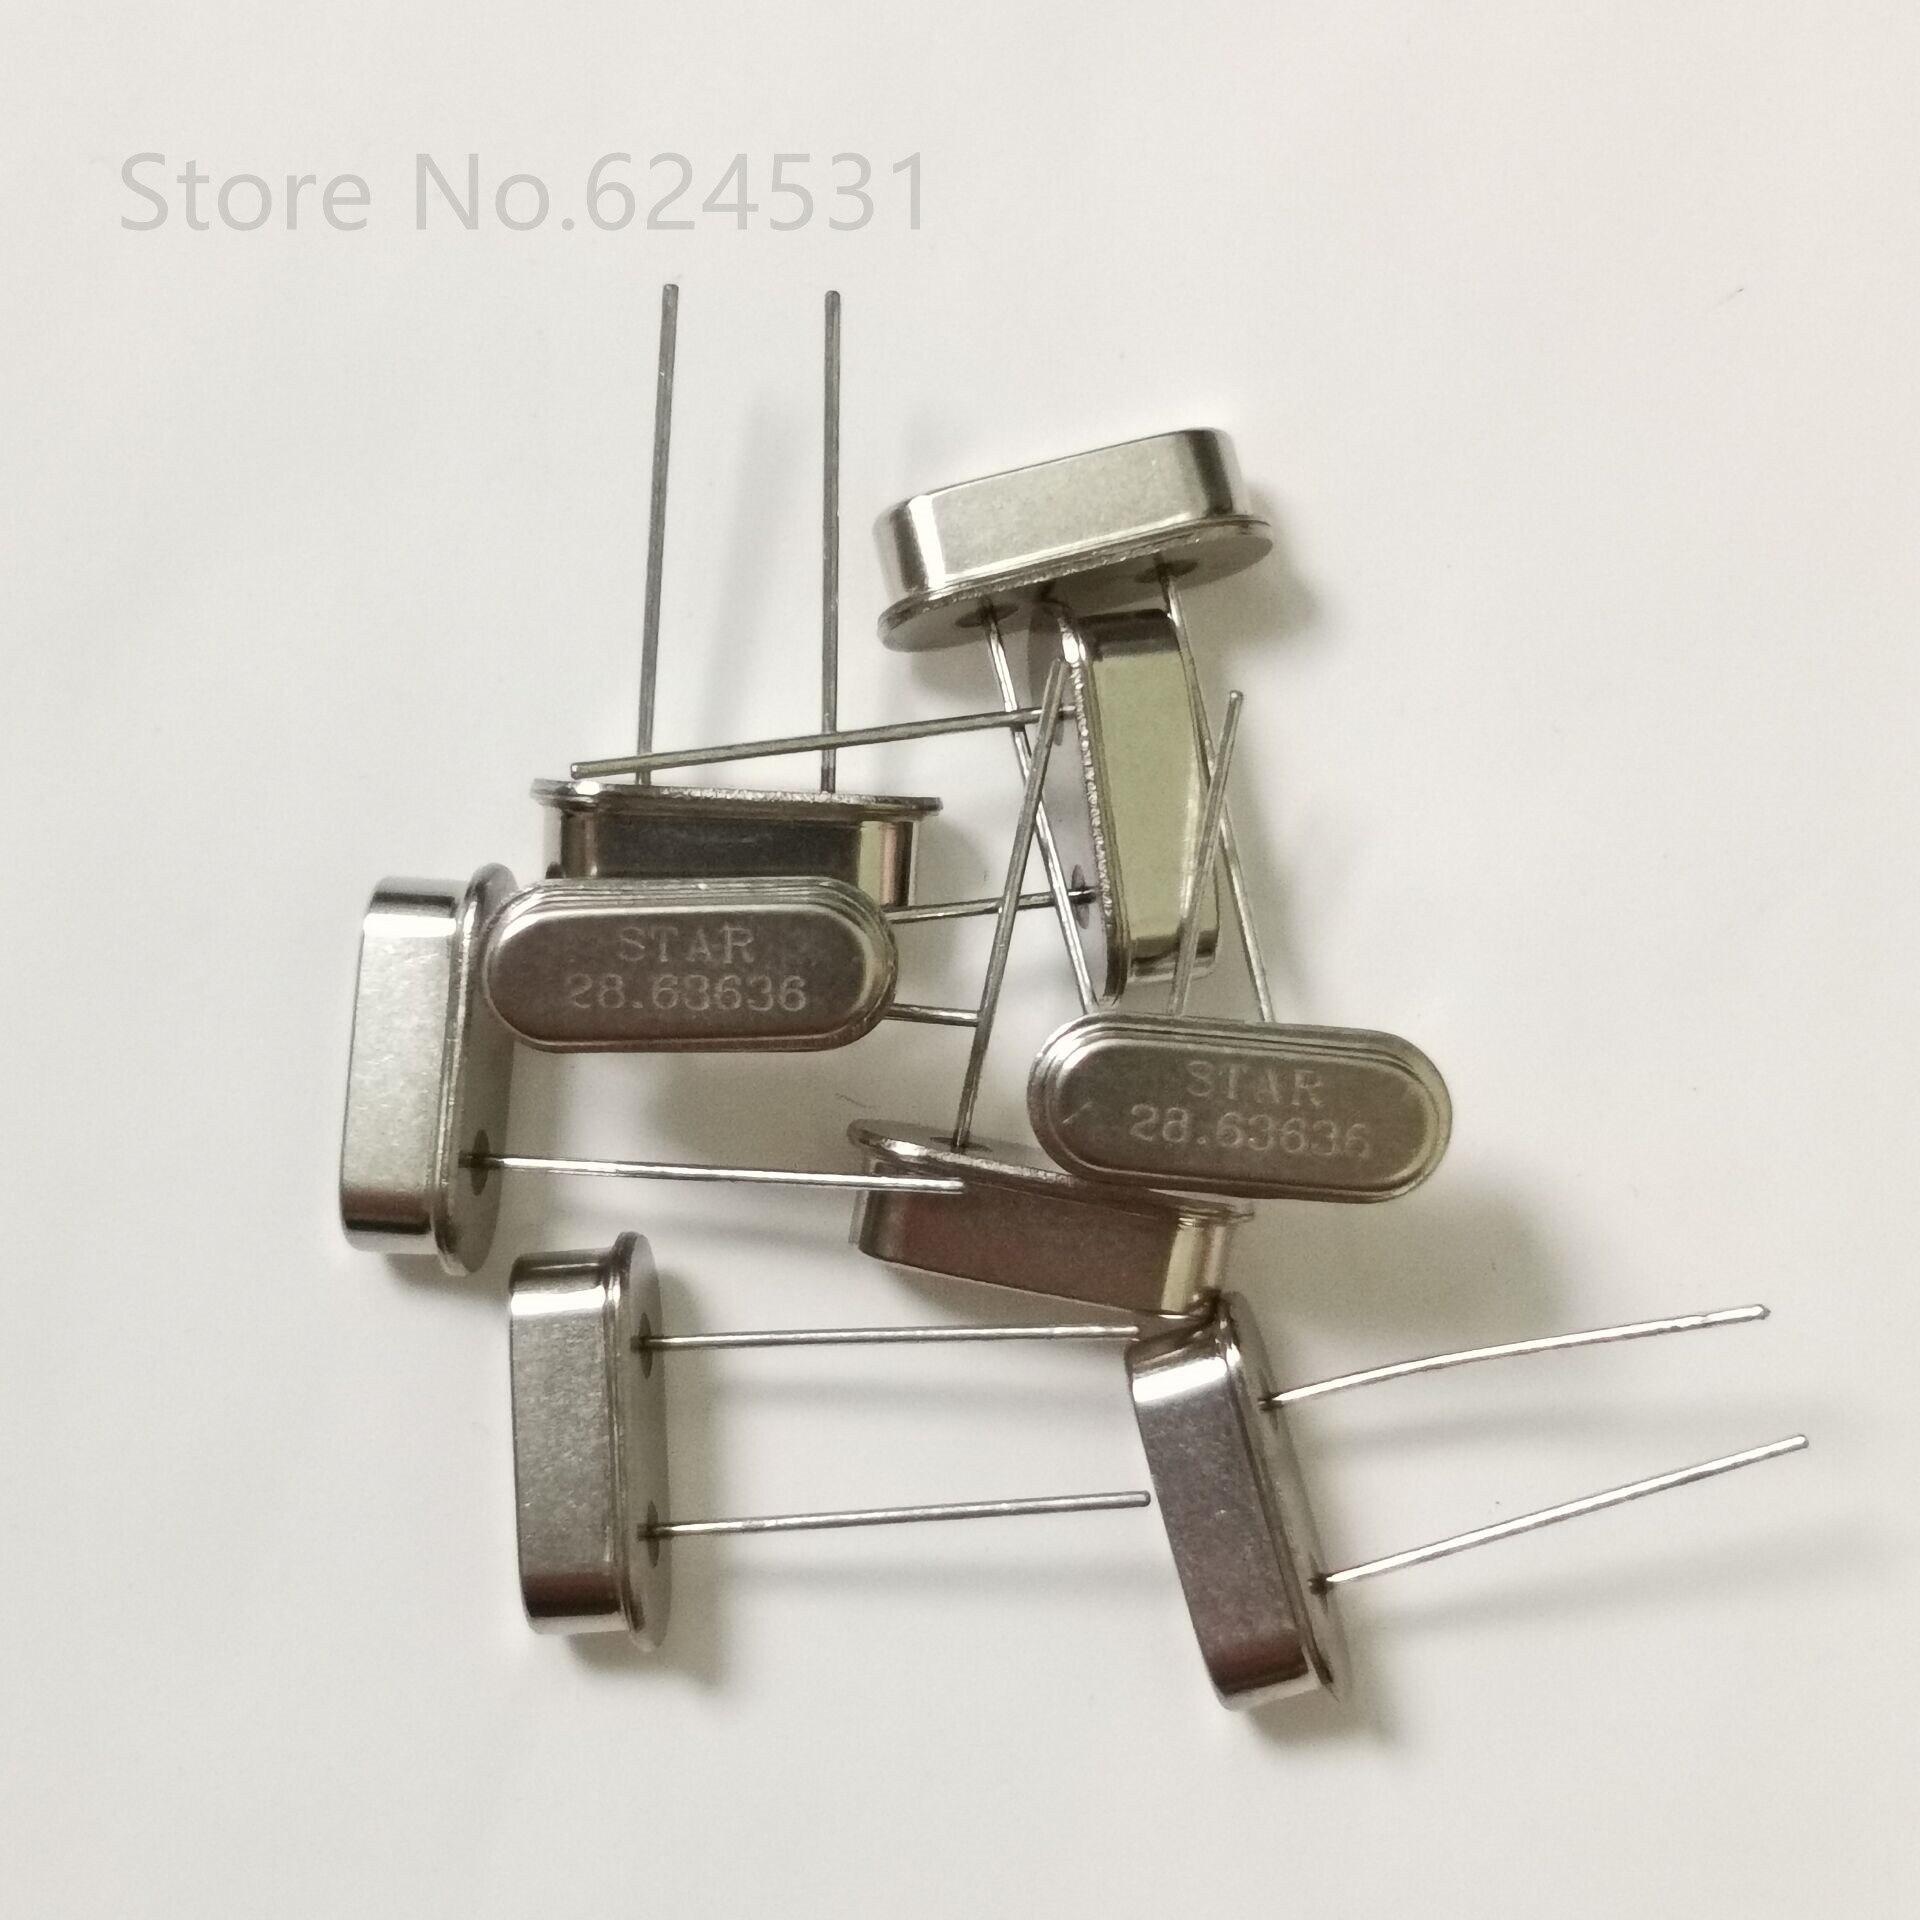 10pcs HC-49S In-line Crystal Oscillator 28.63636MHZ 2P 28.6363M DIP Resonator